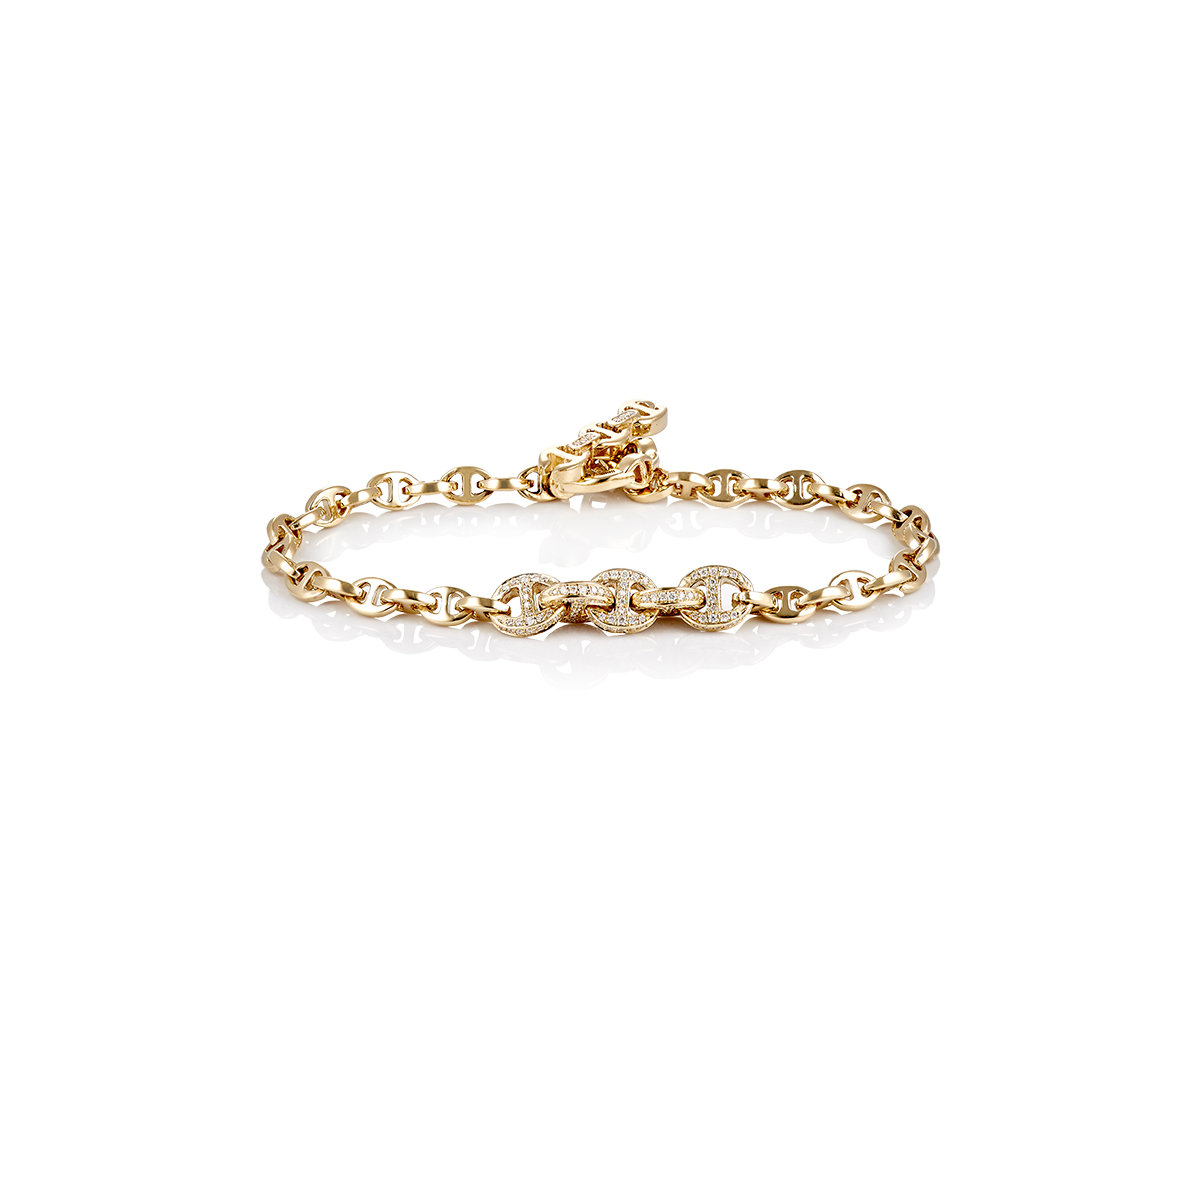 Hoorsenbuhs Womens Tri-Link-Chain Bracelet uUAtYsqW3